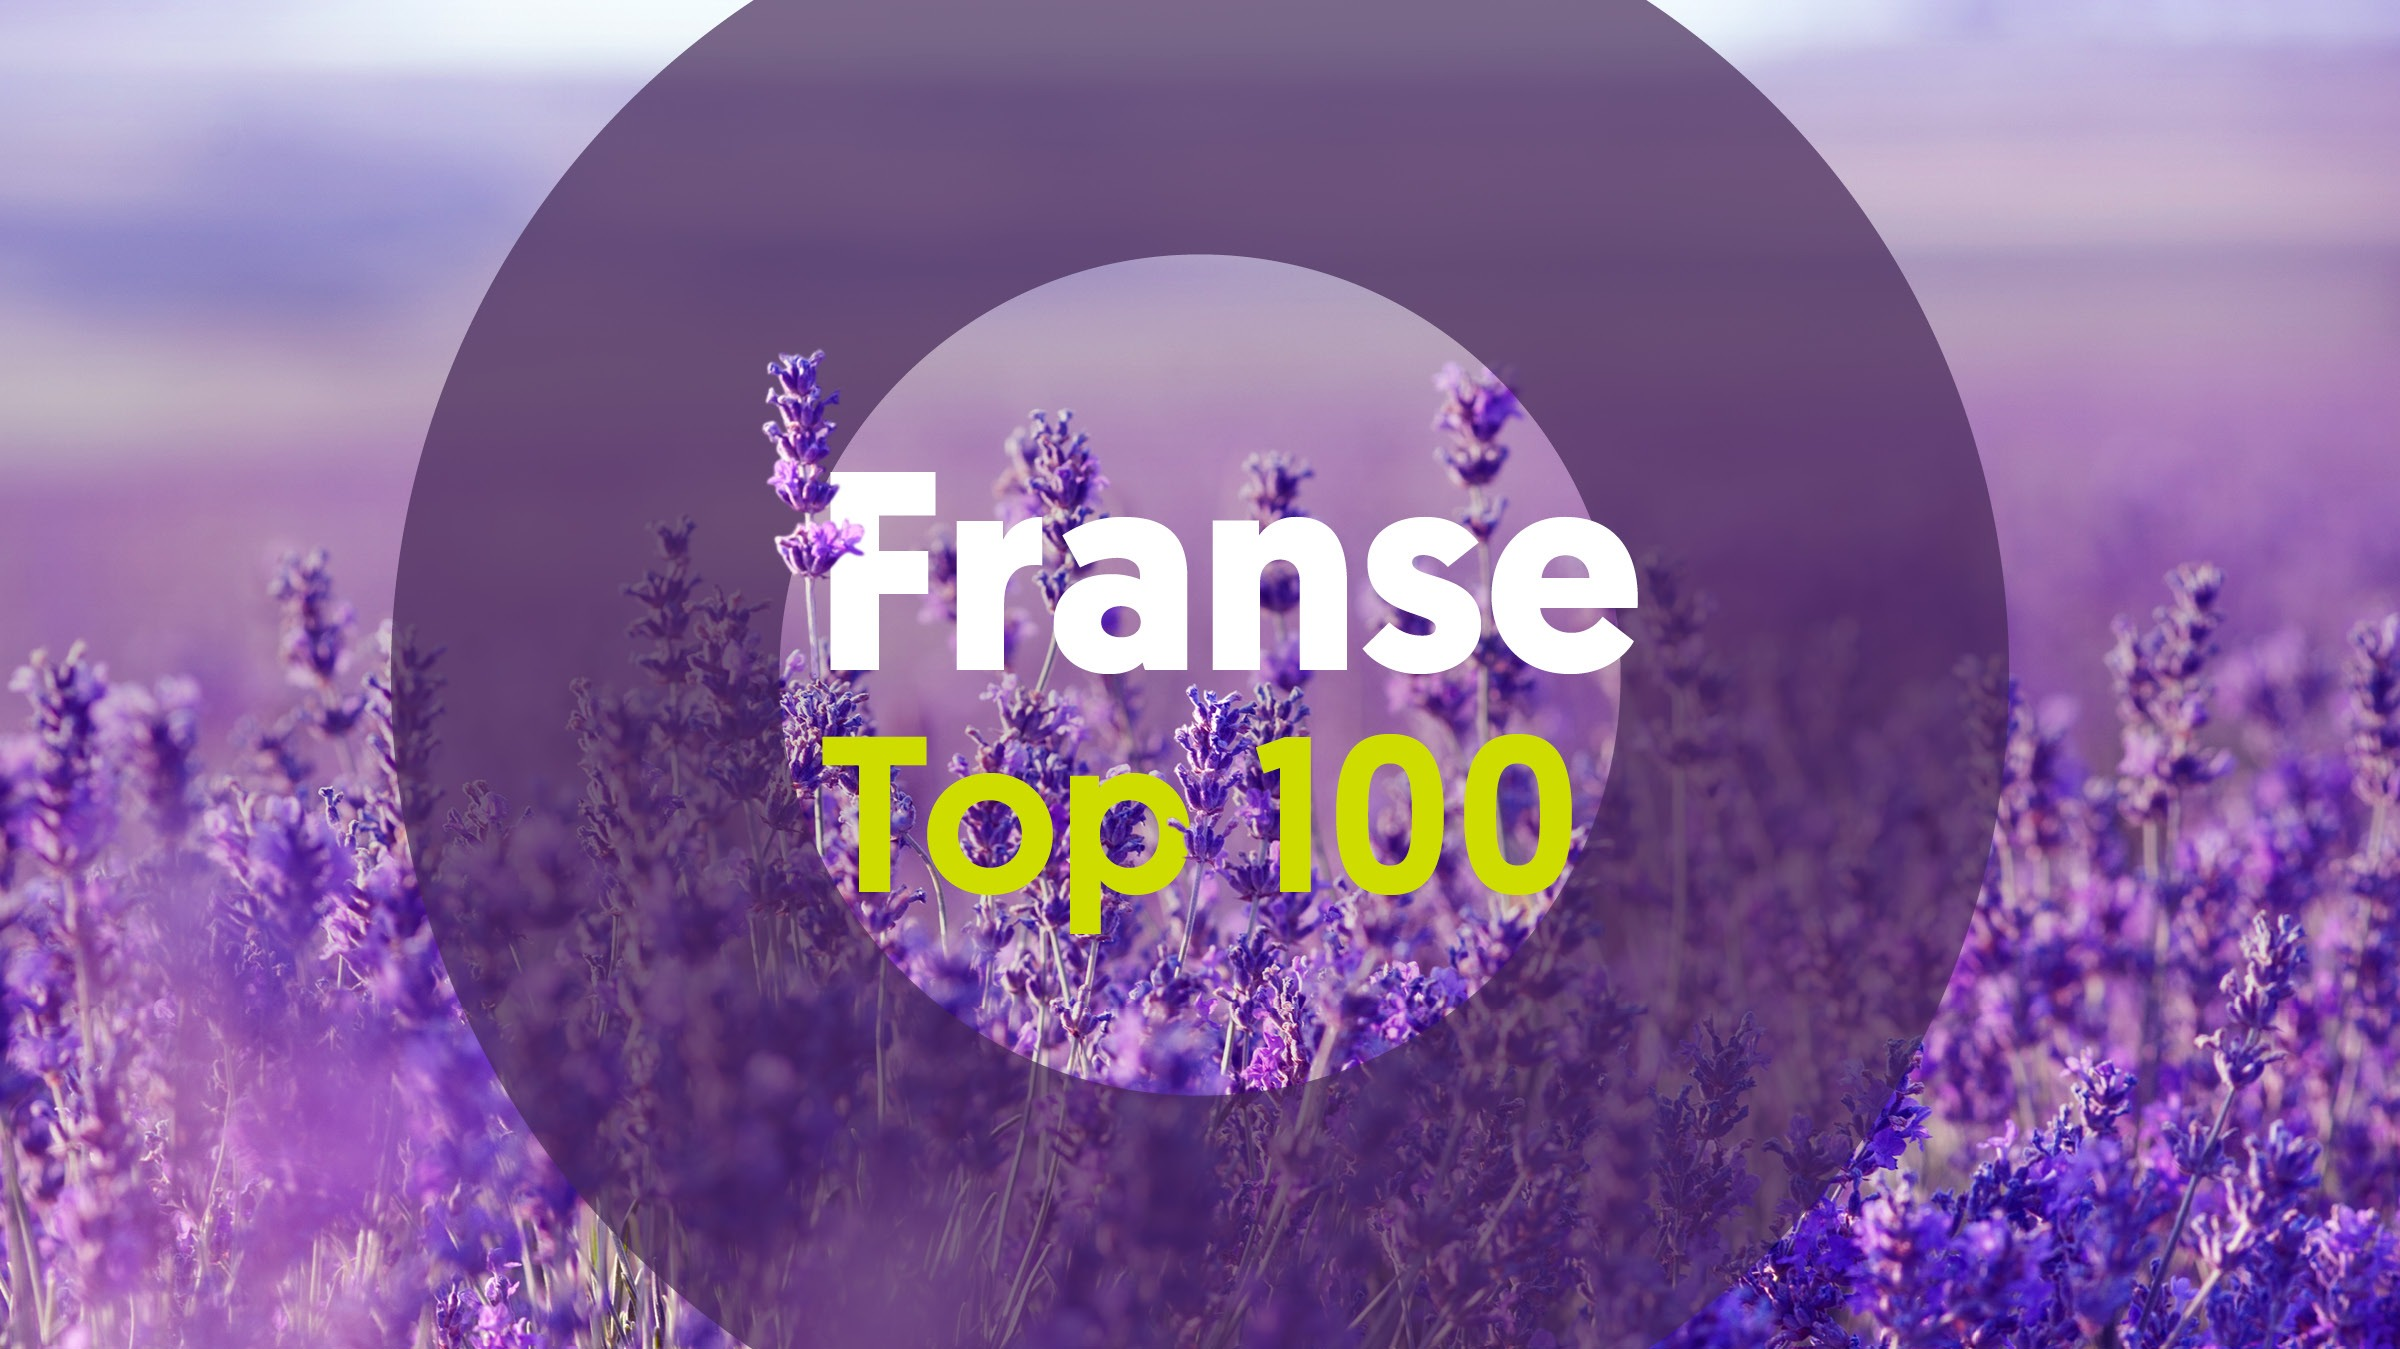 Franse top 100 1 2400x1350 1